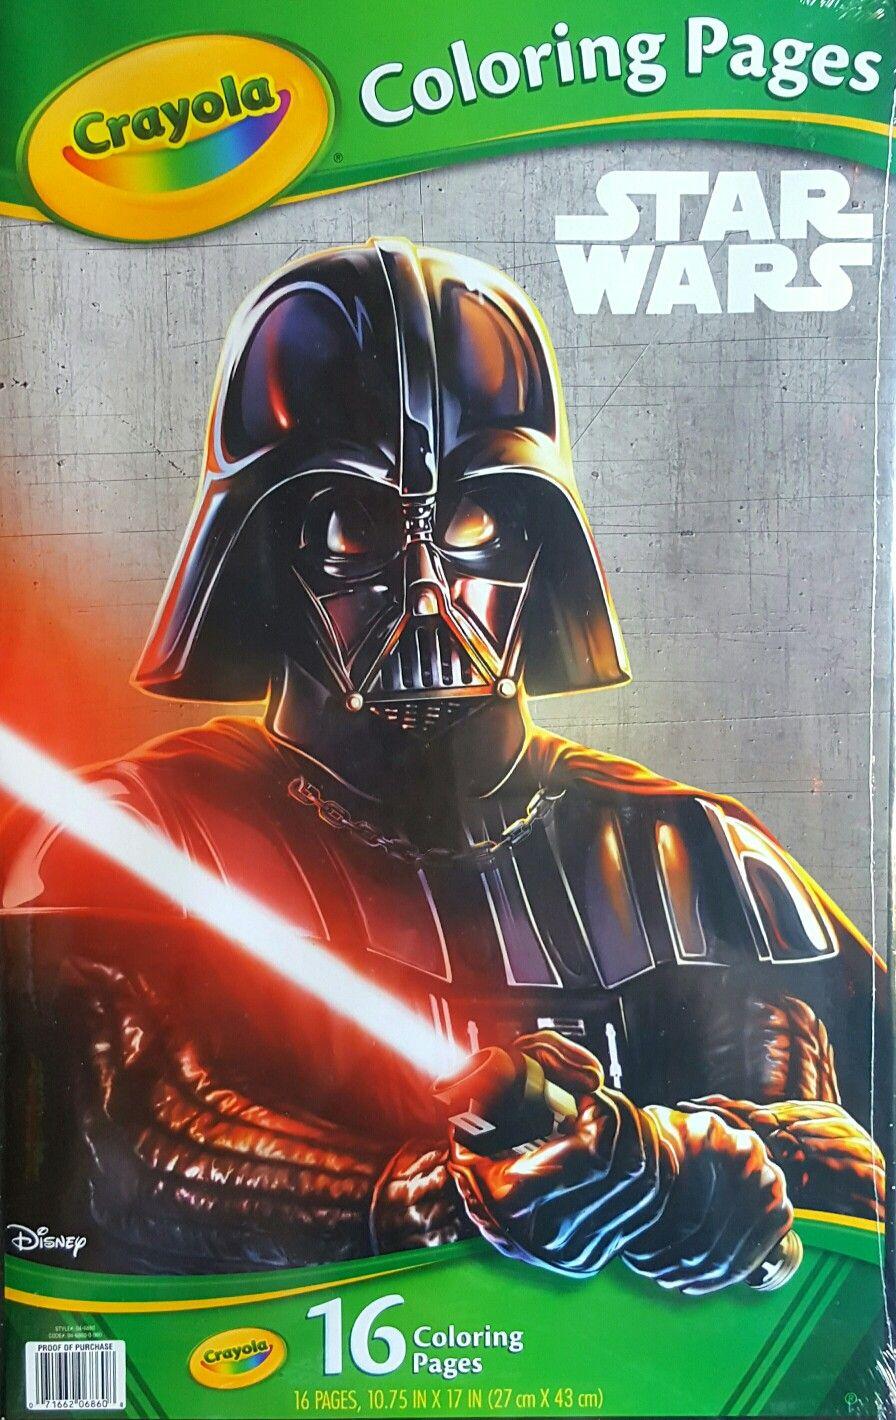 Disney coloring pages crayola - Star Wars Coloring Pages Crayola Disney